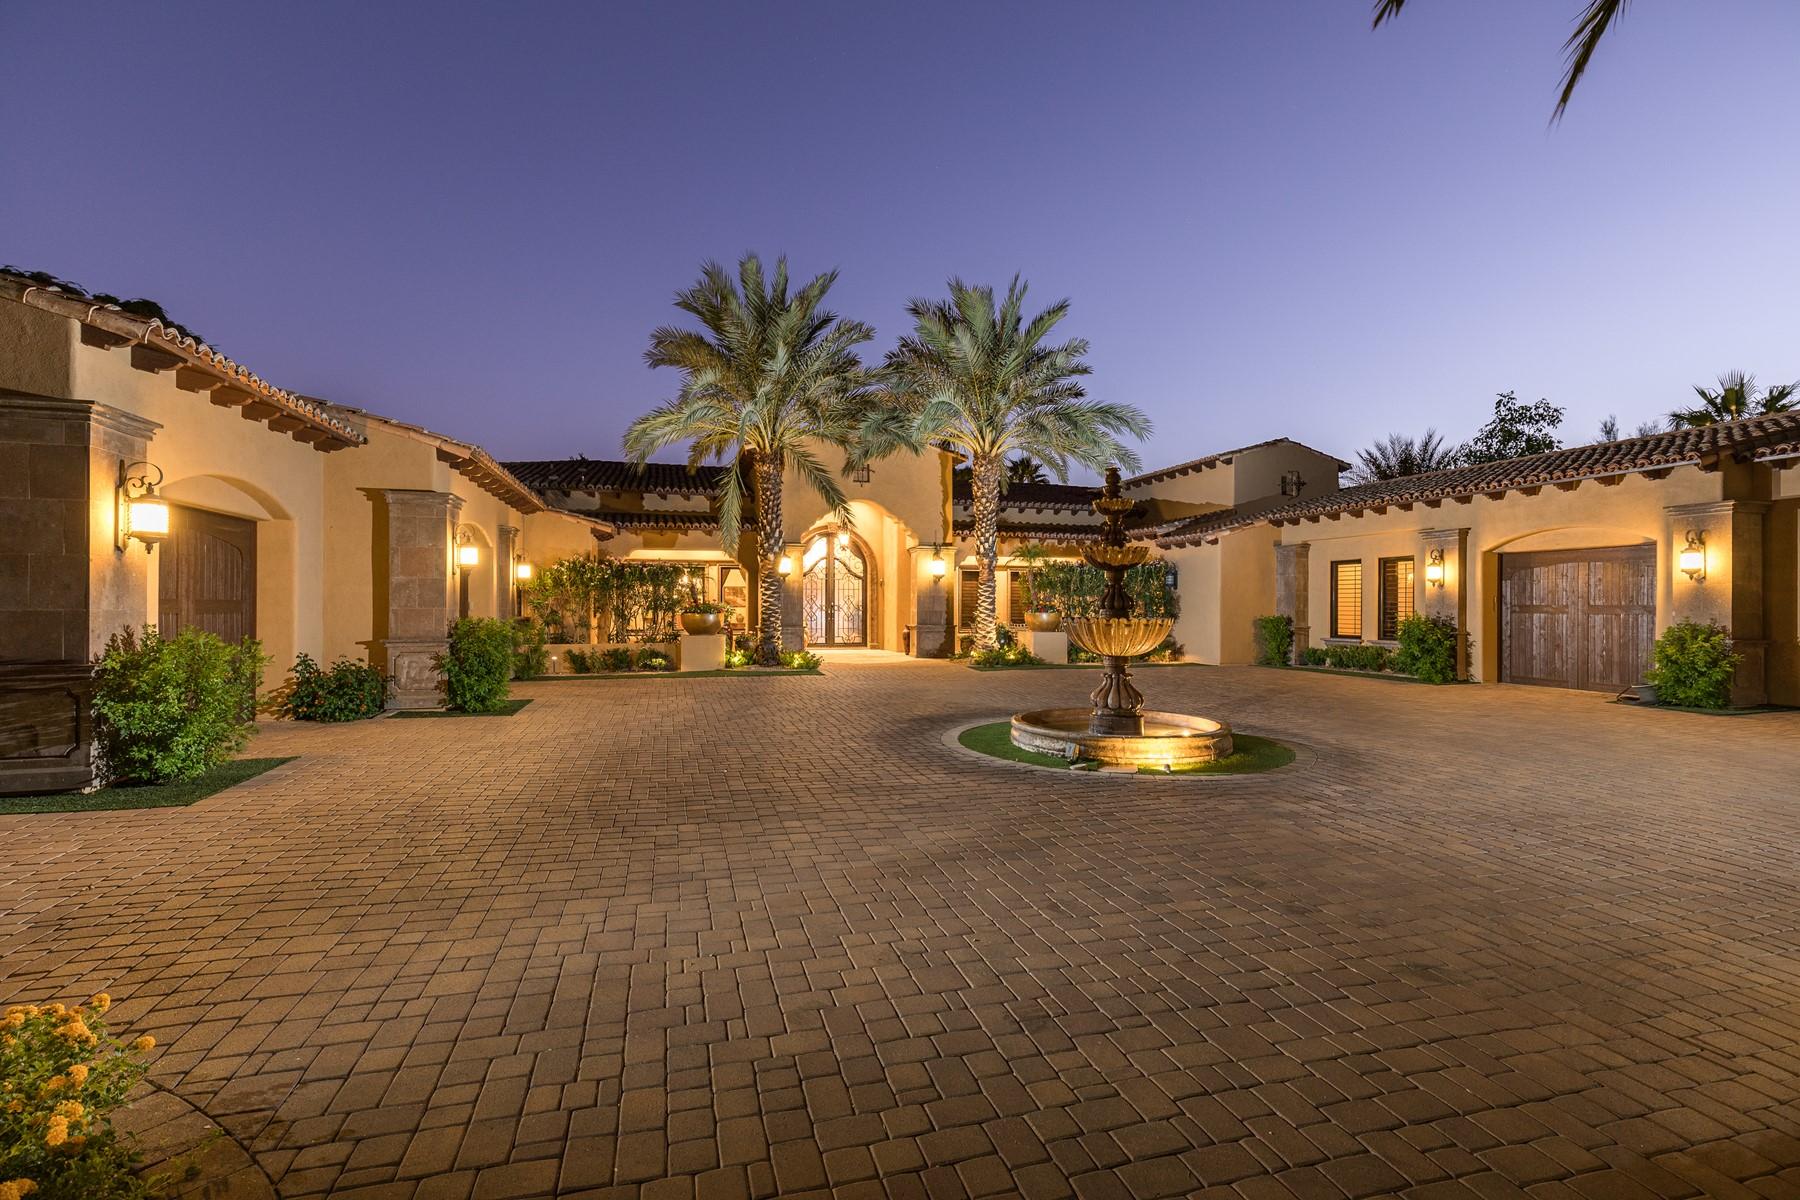 Single Family Homes για την Πώληση στο La Vista 6425 E Mockingbird Ln, Paradise Valley, Αριζονα 85253 Ηνωμένες Πολιτείες